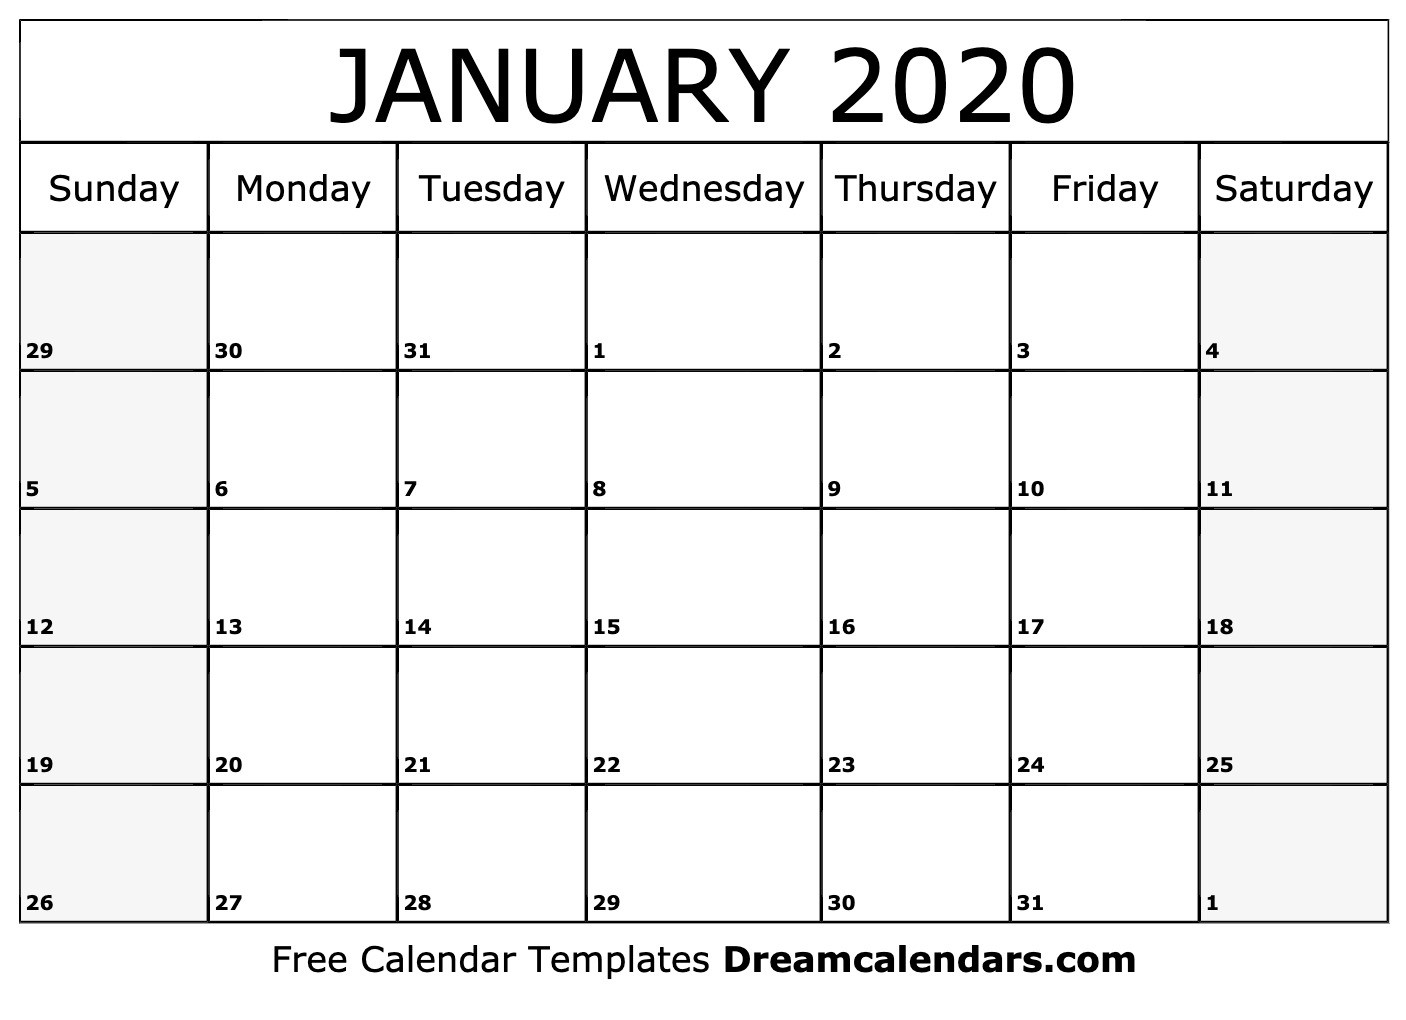 Printable January 2020 Calendar-January 2020 Lunar Calendar